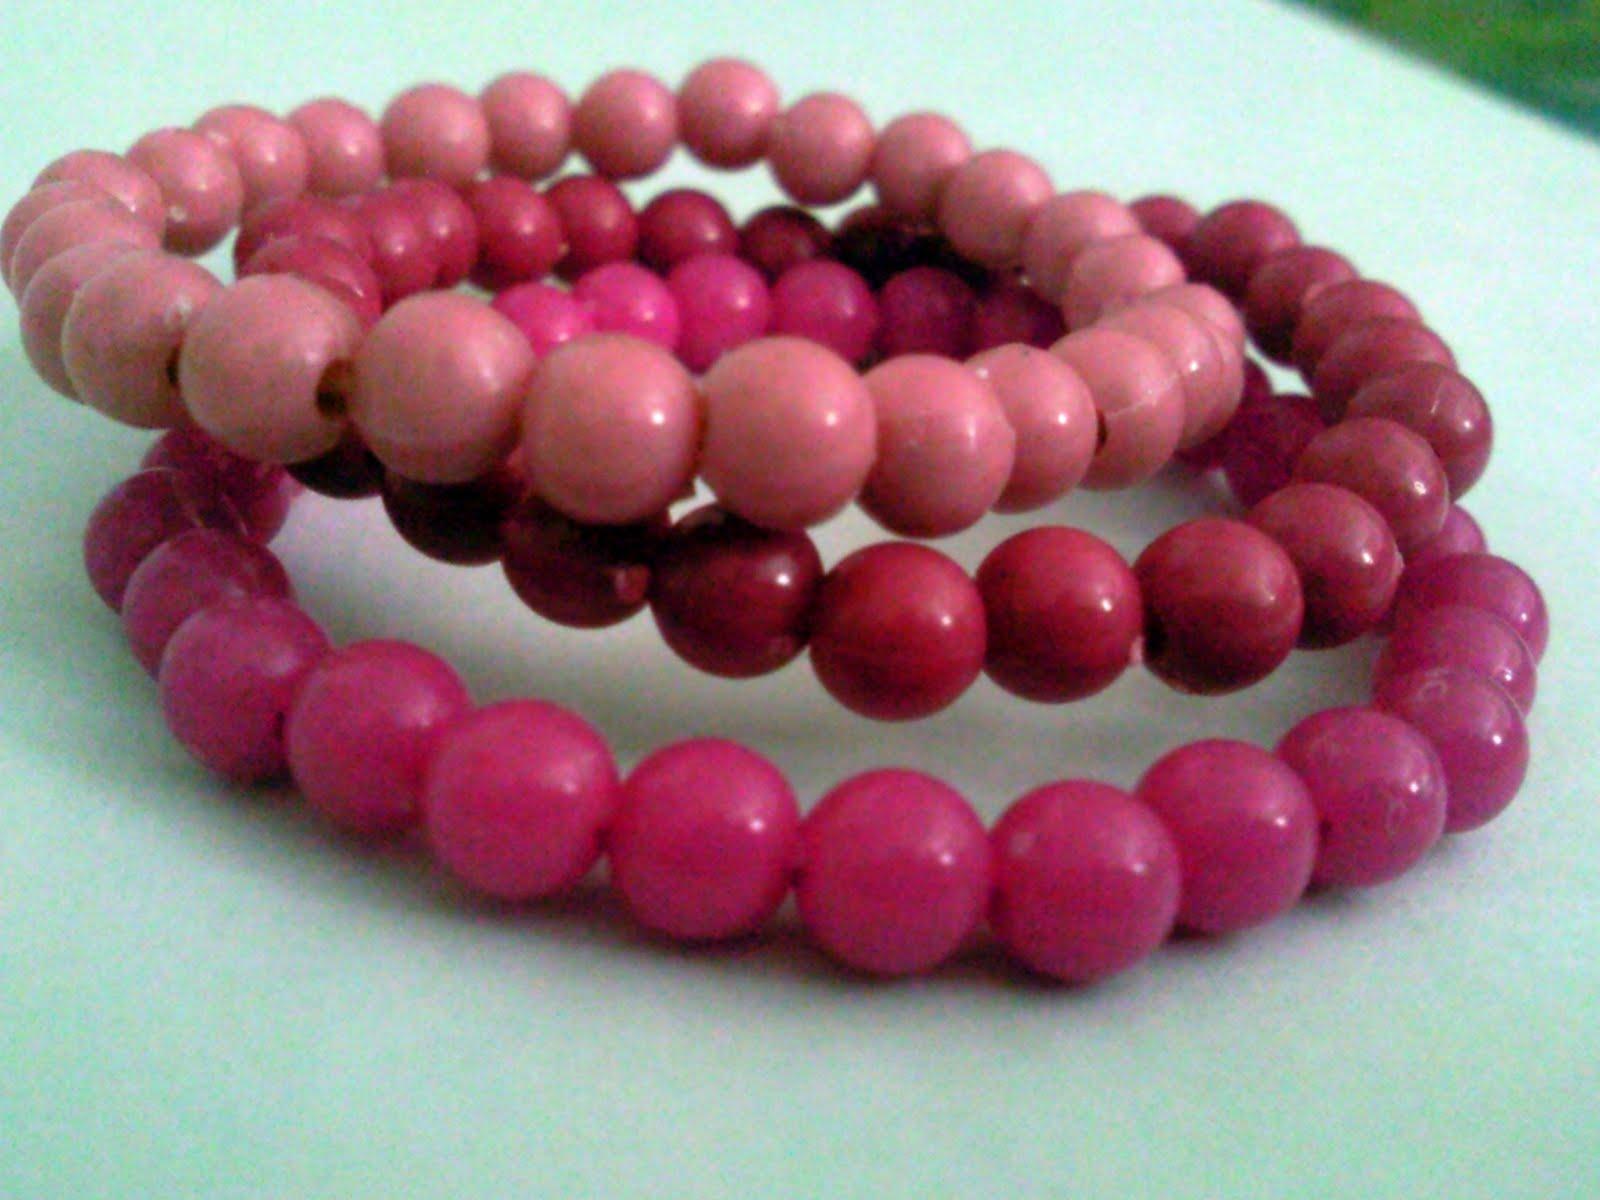 All About Plastic Beads Jewelry, Bracelet and Art | Utsavpedia